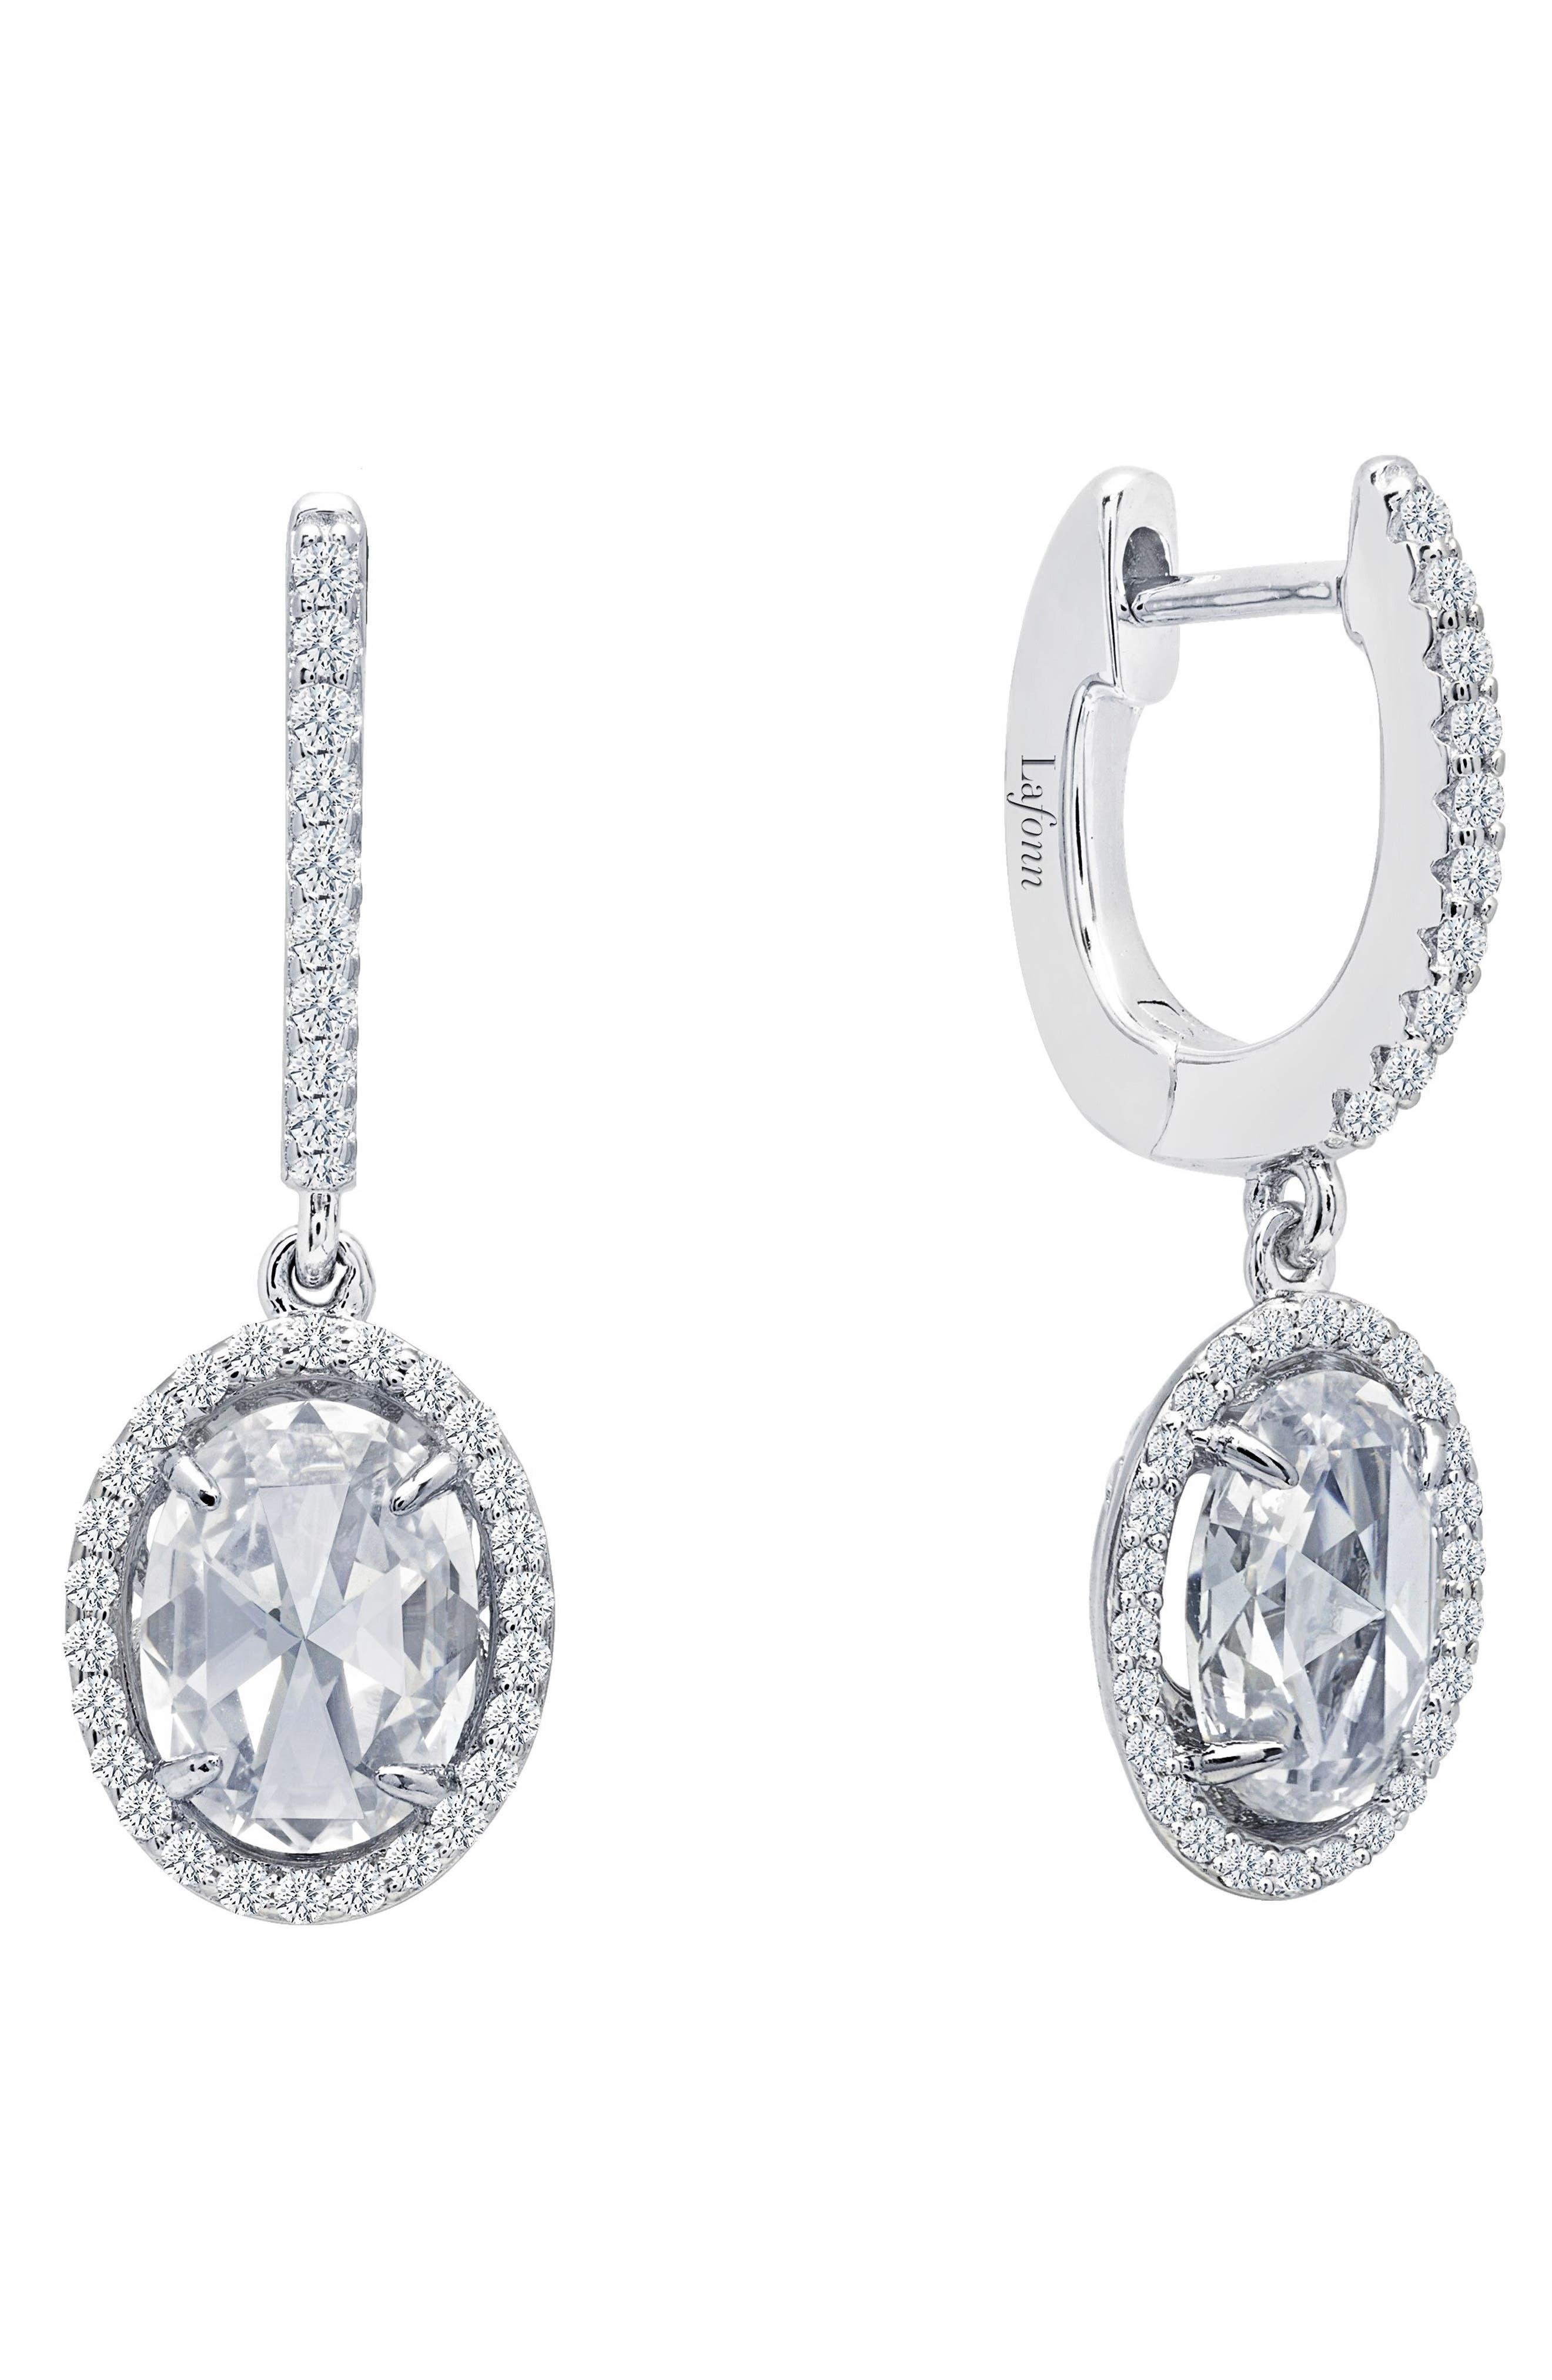 Simulated Diamond Drop Earrings,                         Main,                         color, 040